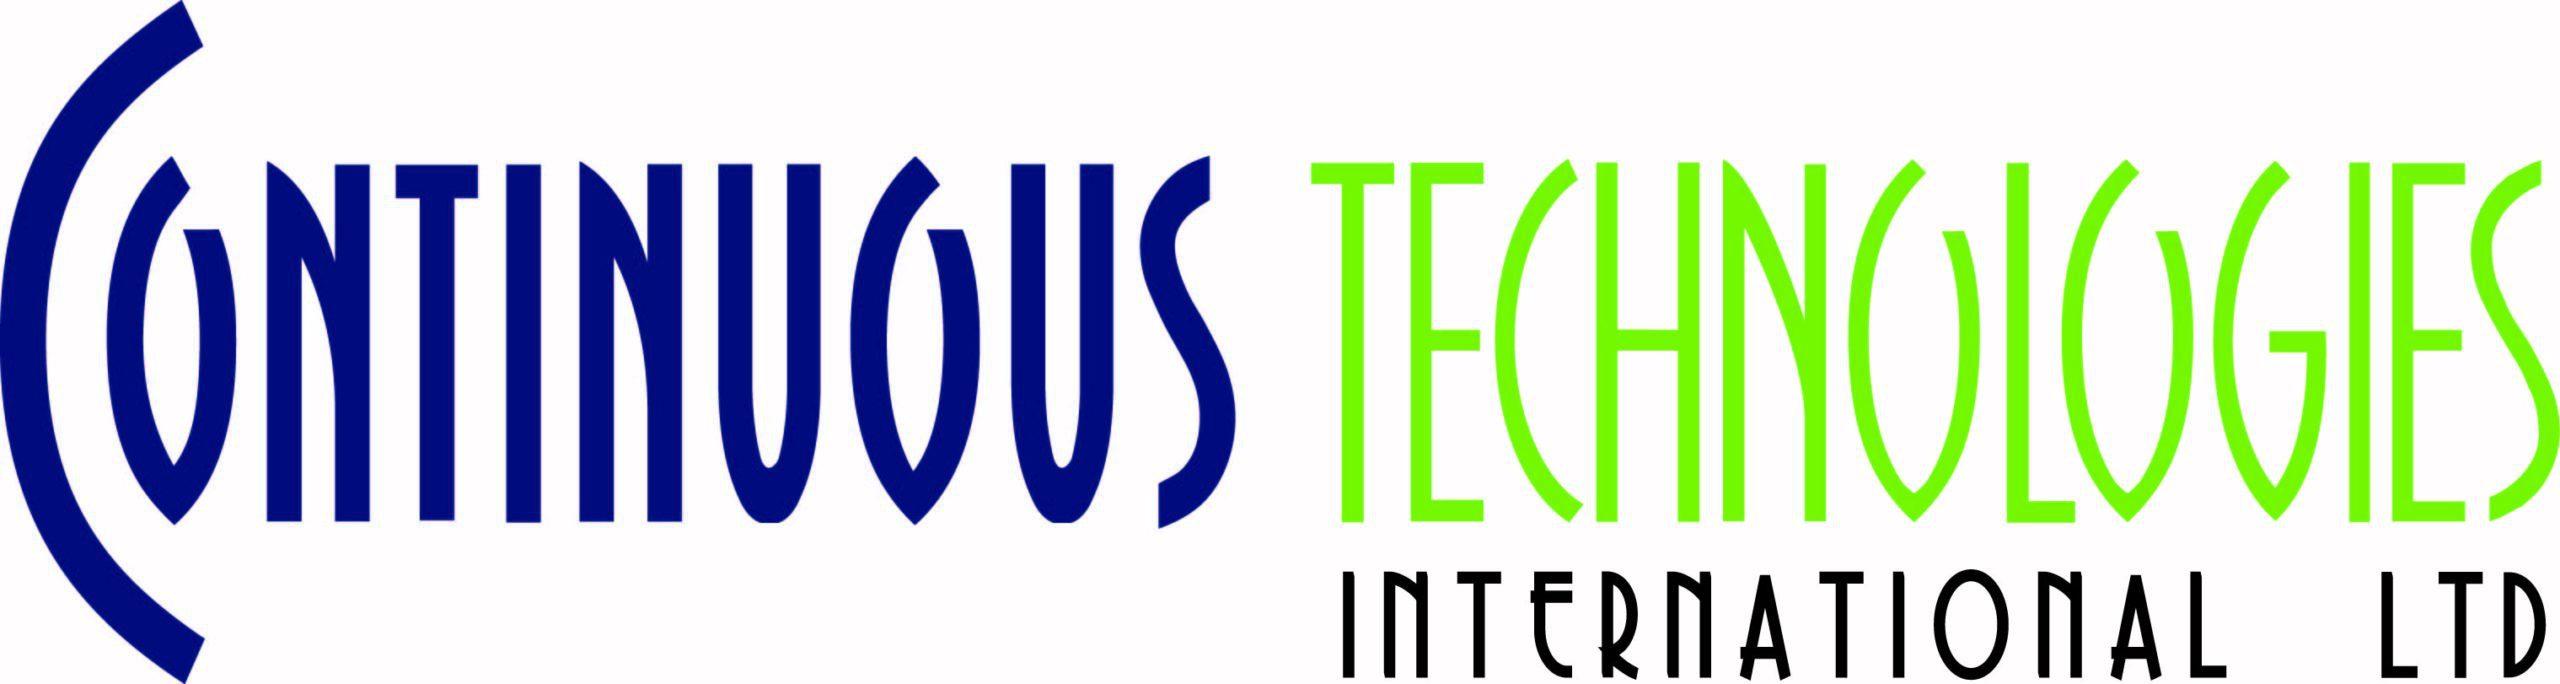 Continuous Technologies International Ltd